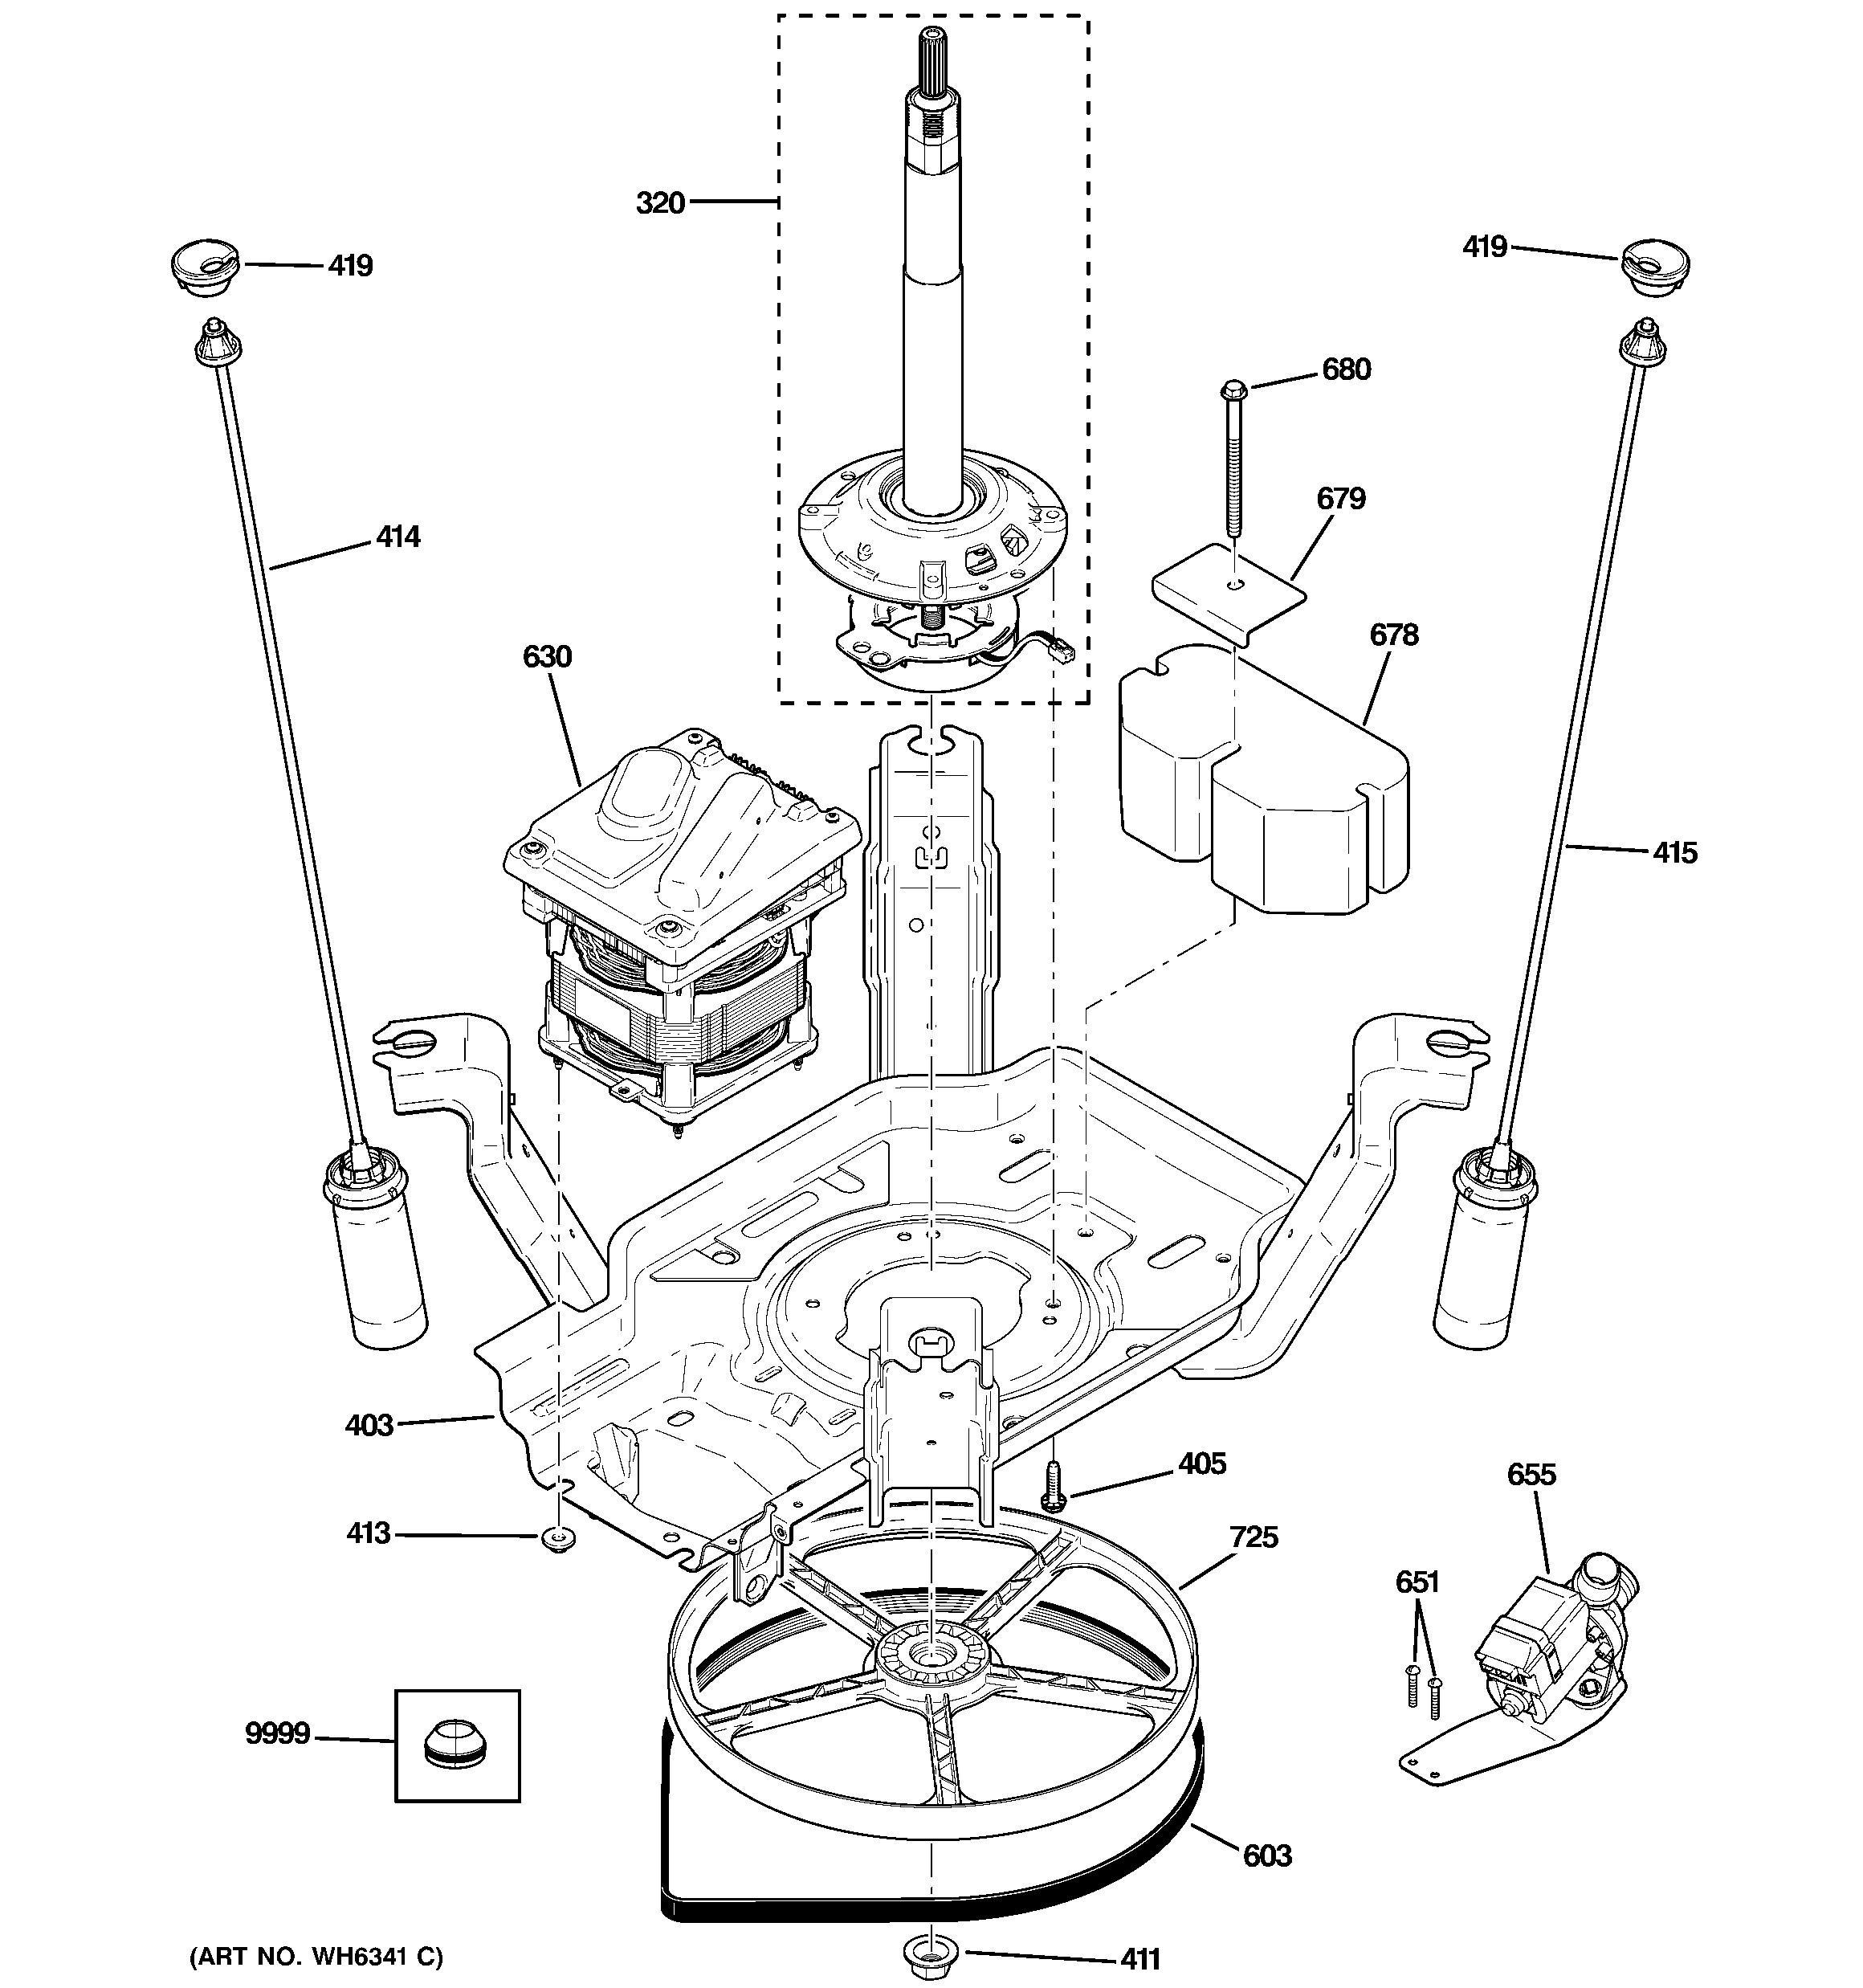 4 Stroke Engine Diagram Parts Ge Model Wlrr5000g0ww Residential Washers Genuine Parts Of 4 Stroke Engine Diagram Parts